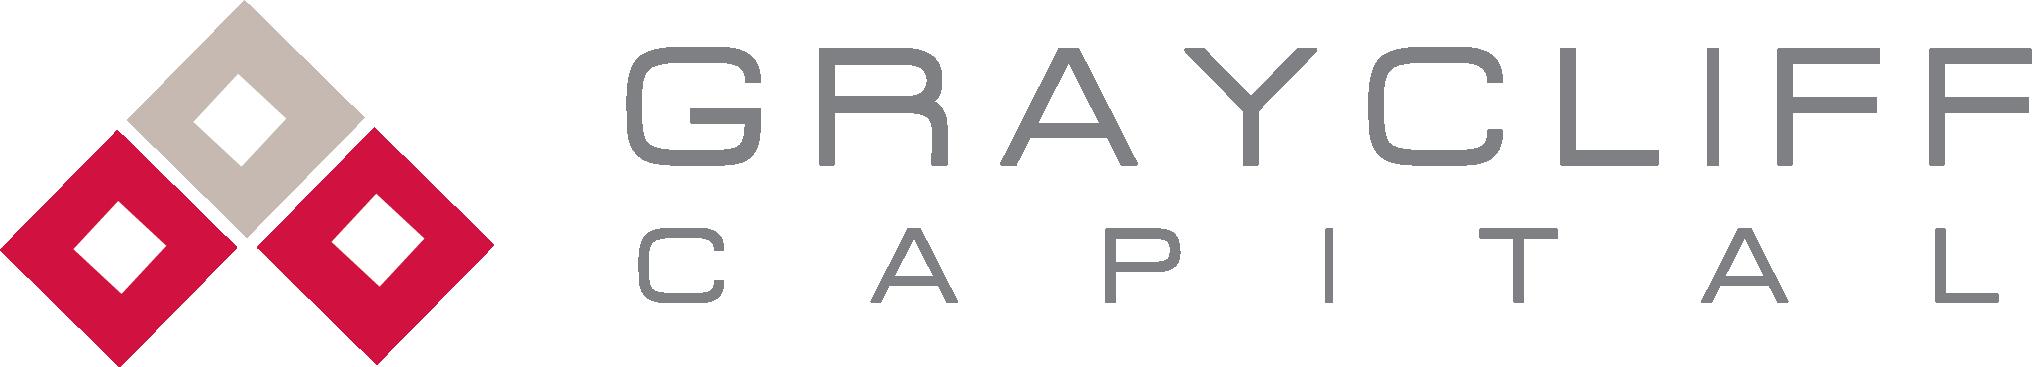 Final Logo'.png